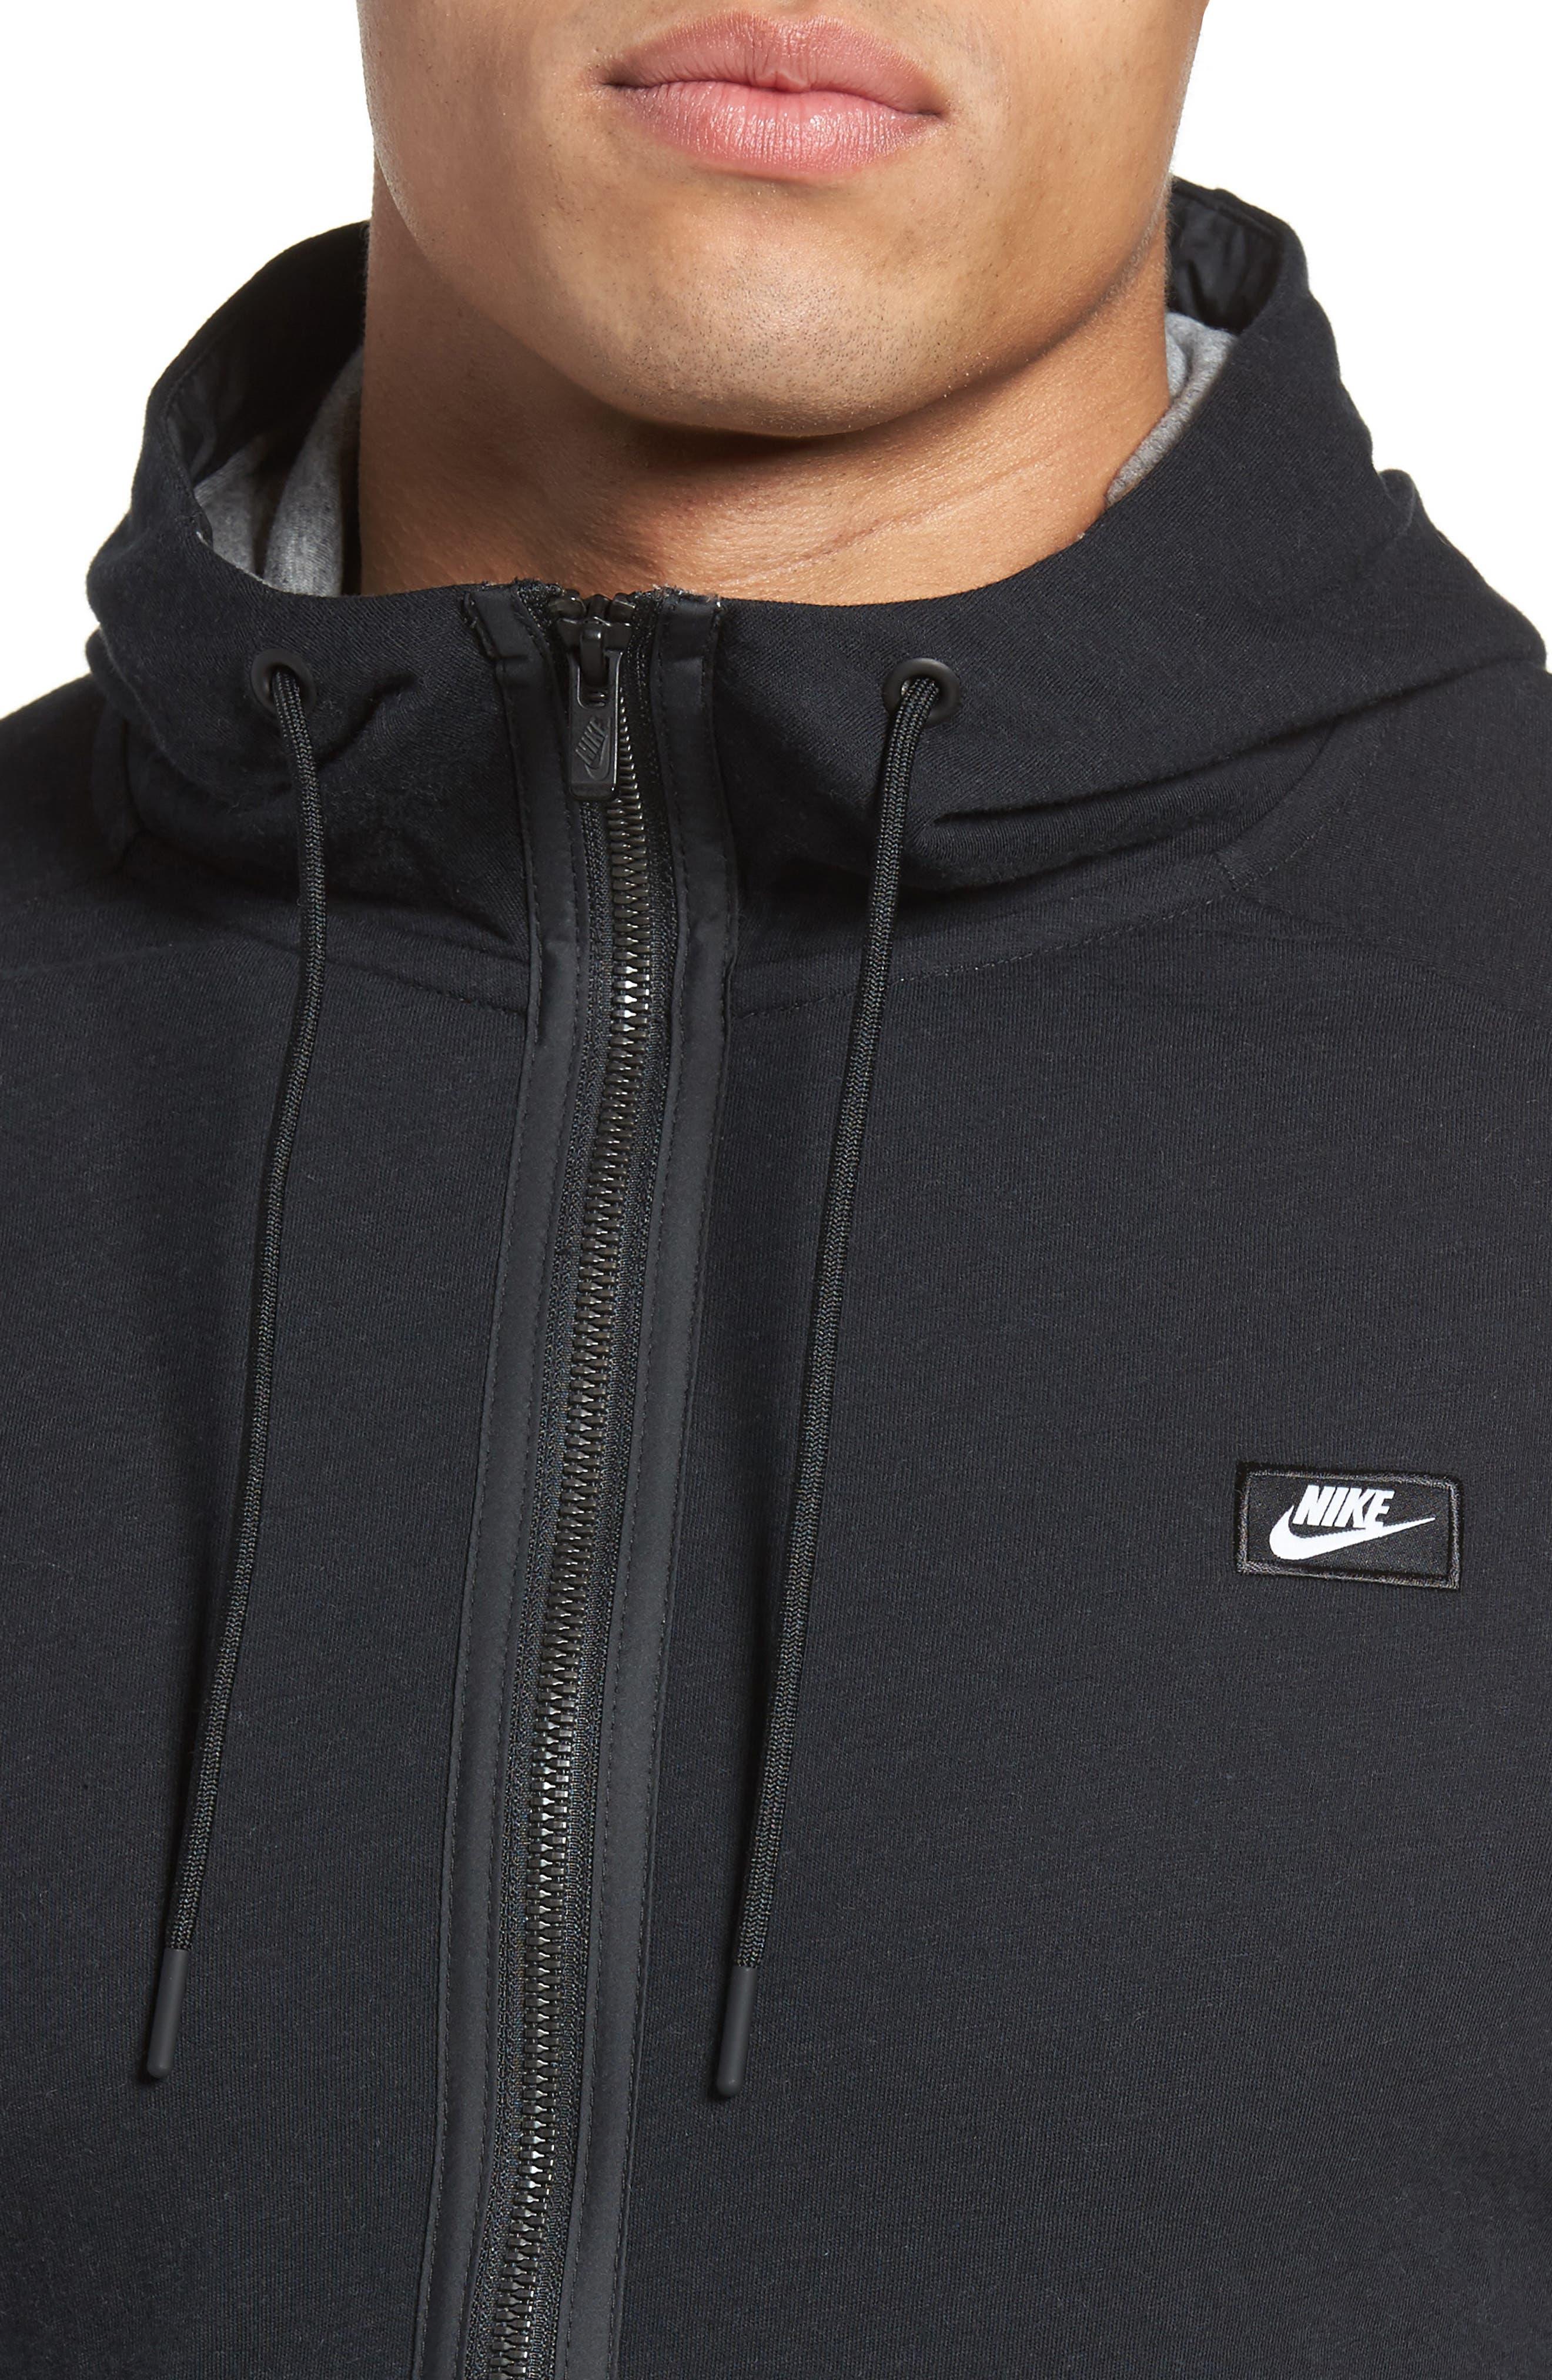 NIKE, Tech Regular Fit Fleece Hoodie, Alternate thumbnail 5, color, BLACK/ CARBON HEATHER